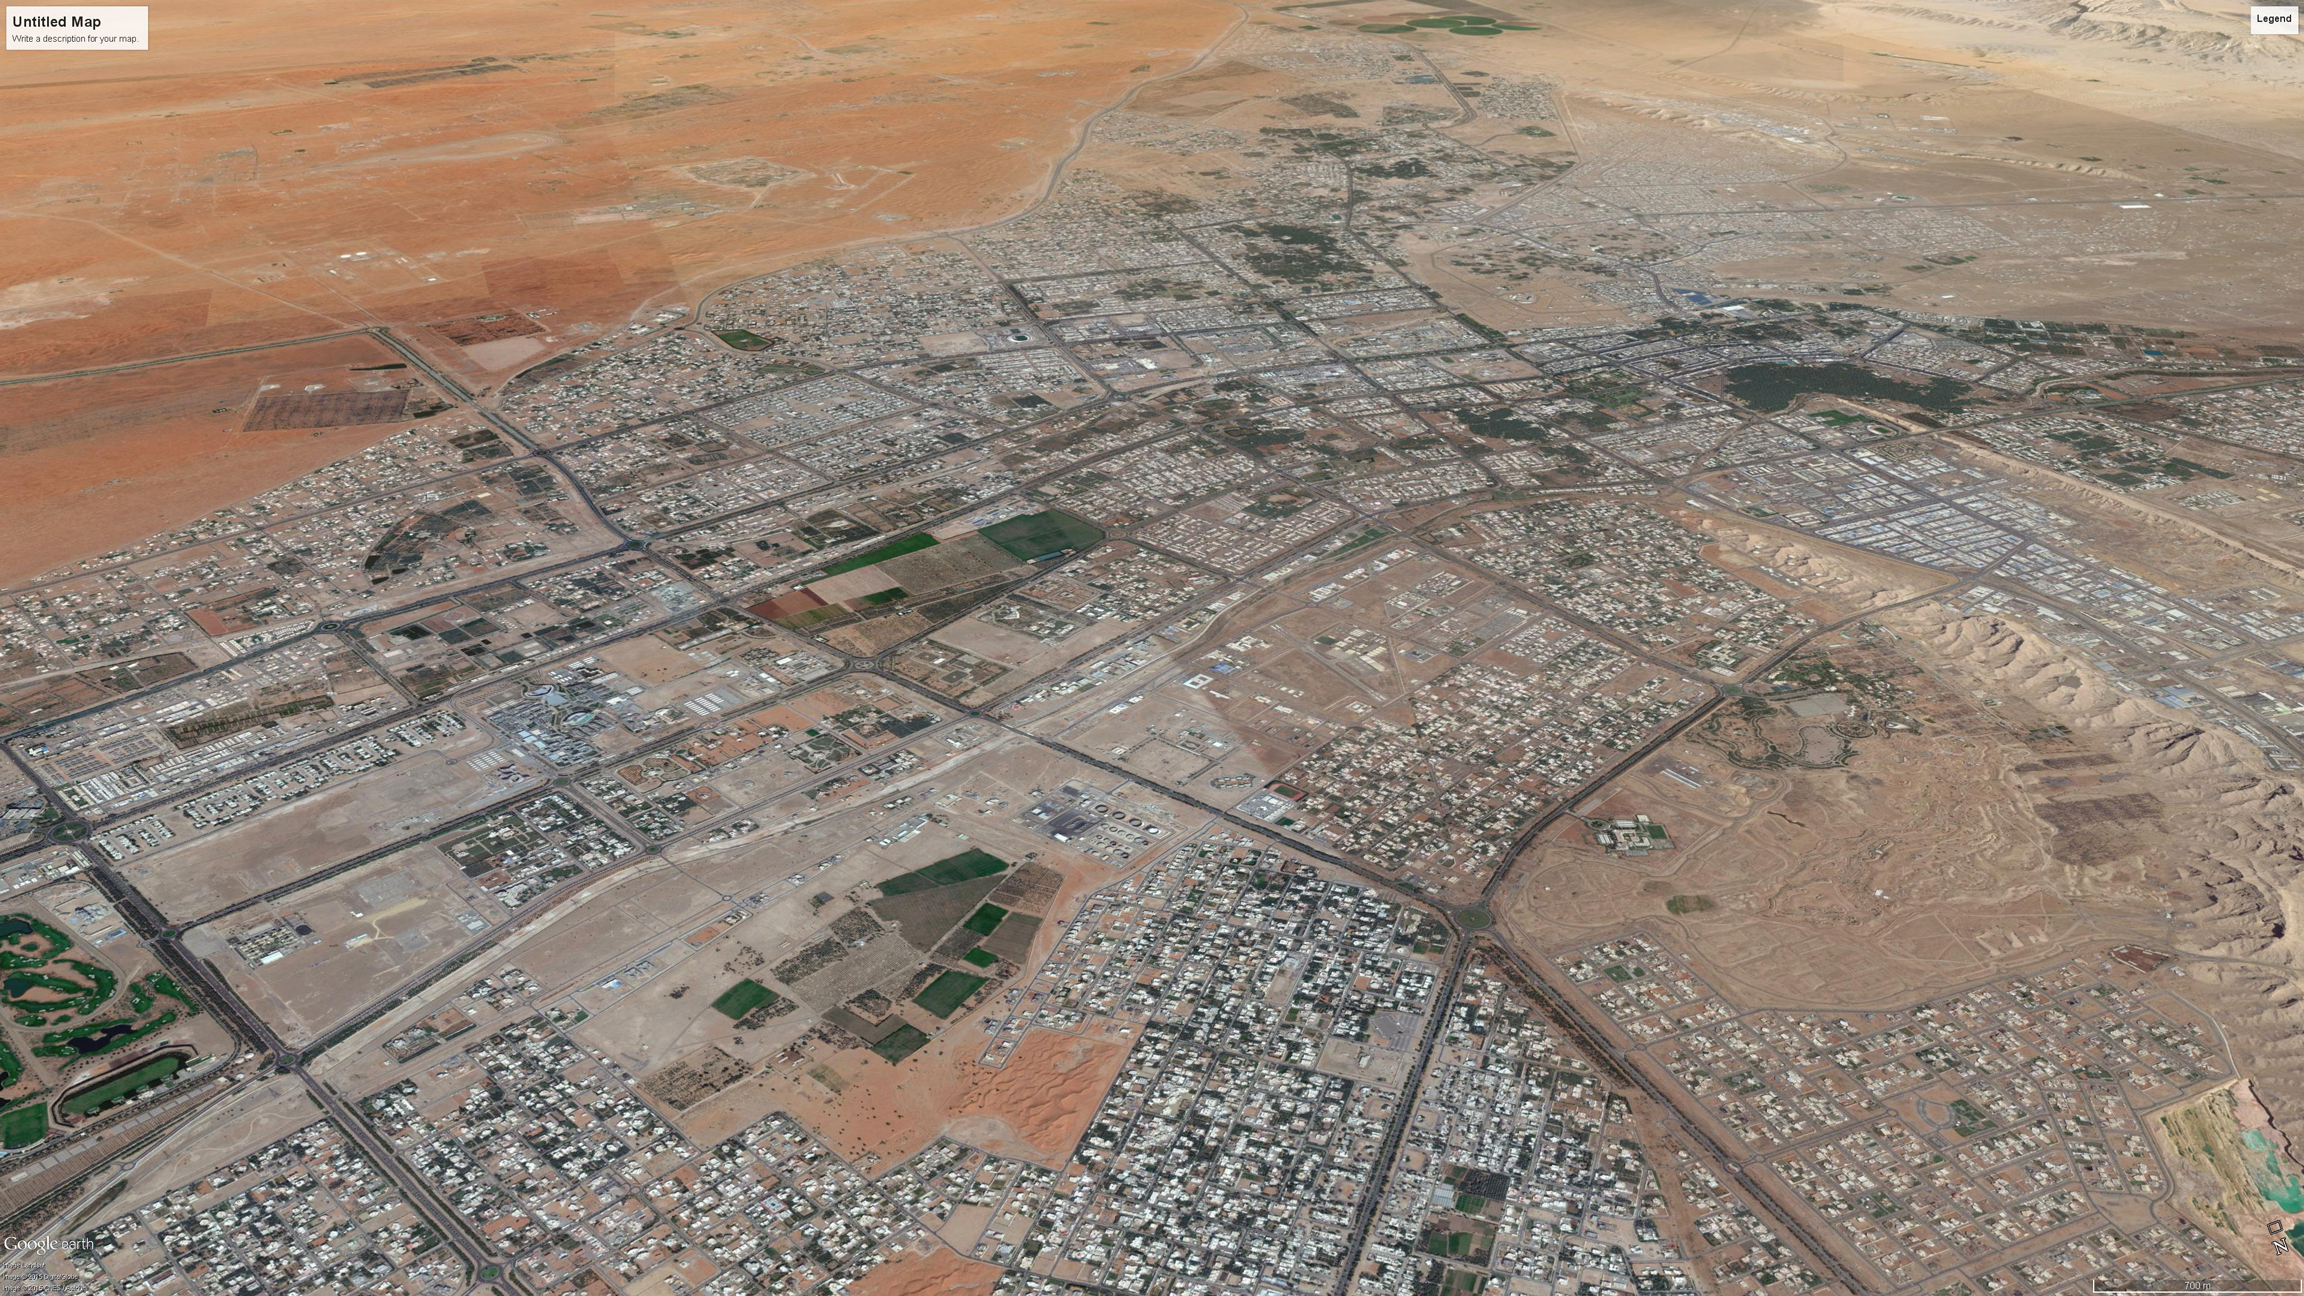 Al Ain Transportation Studies: Transit Corridors and Hubs